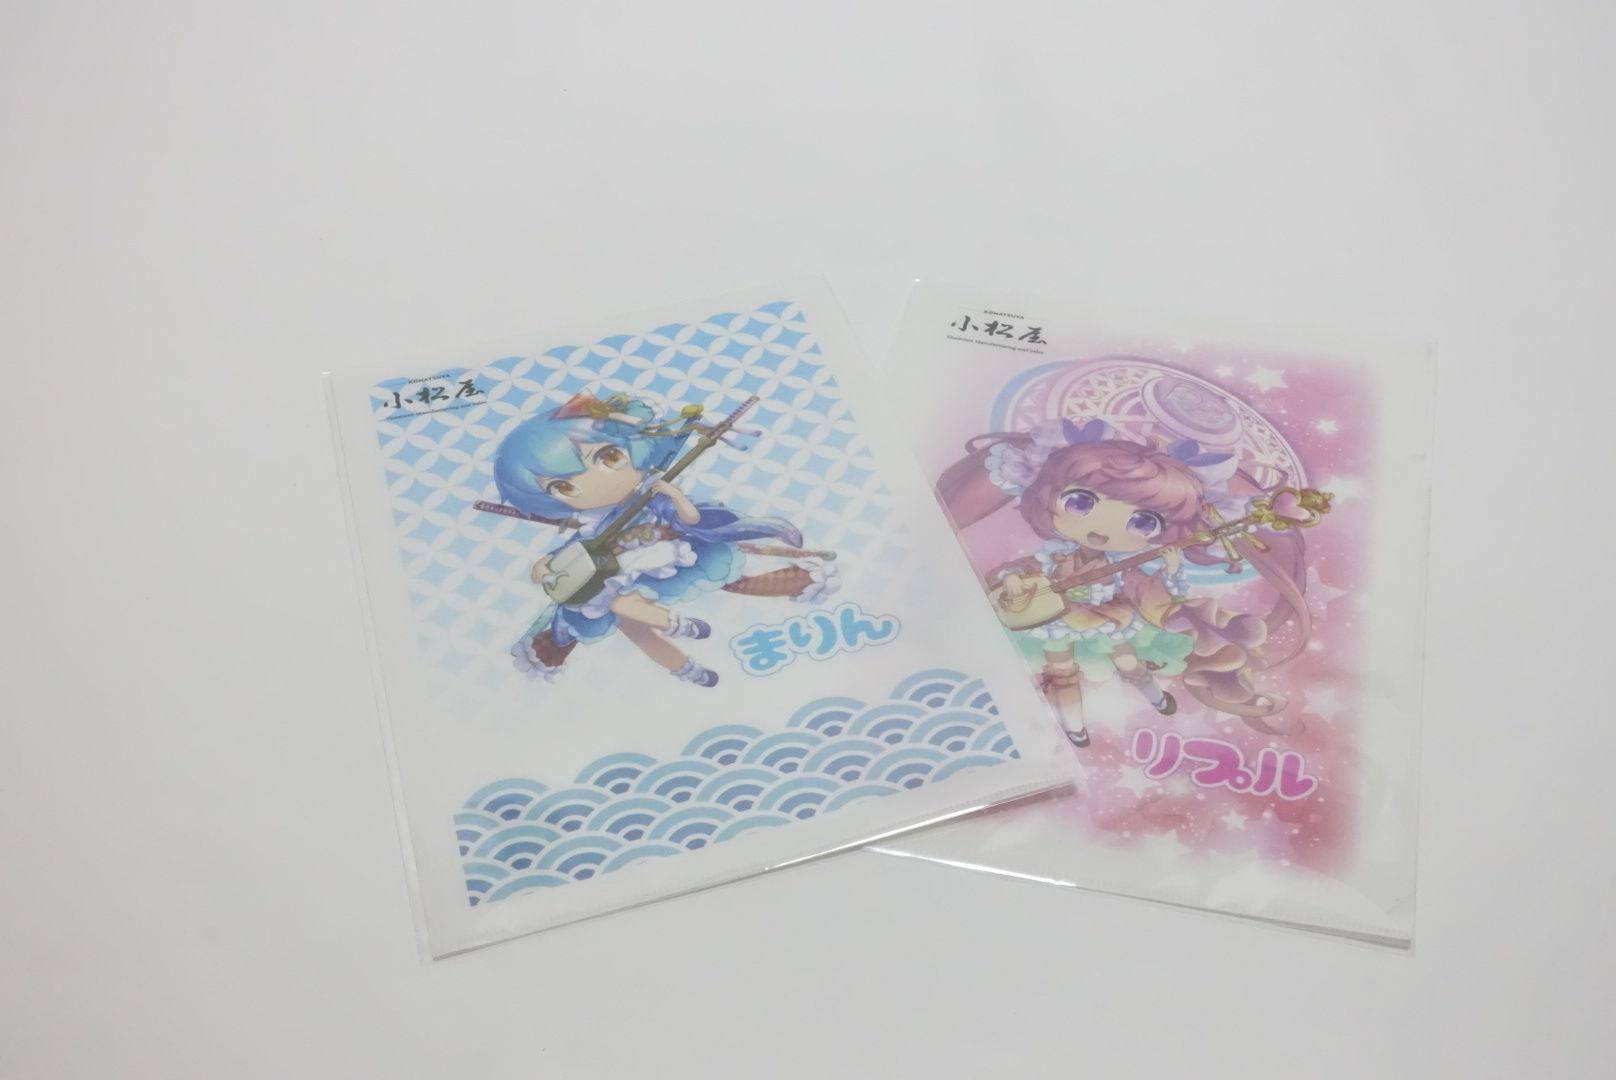 [kr0003]小松屋オリジナルキャラクター リプル・まりん クリアファイル